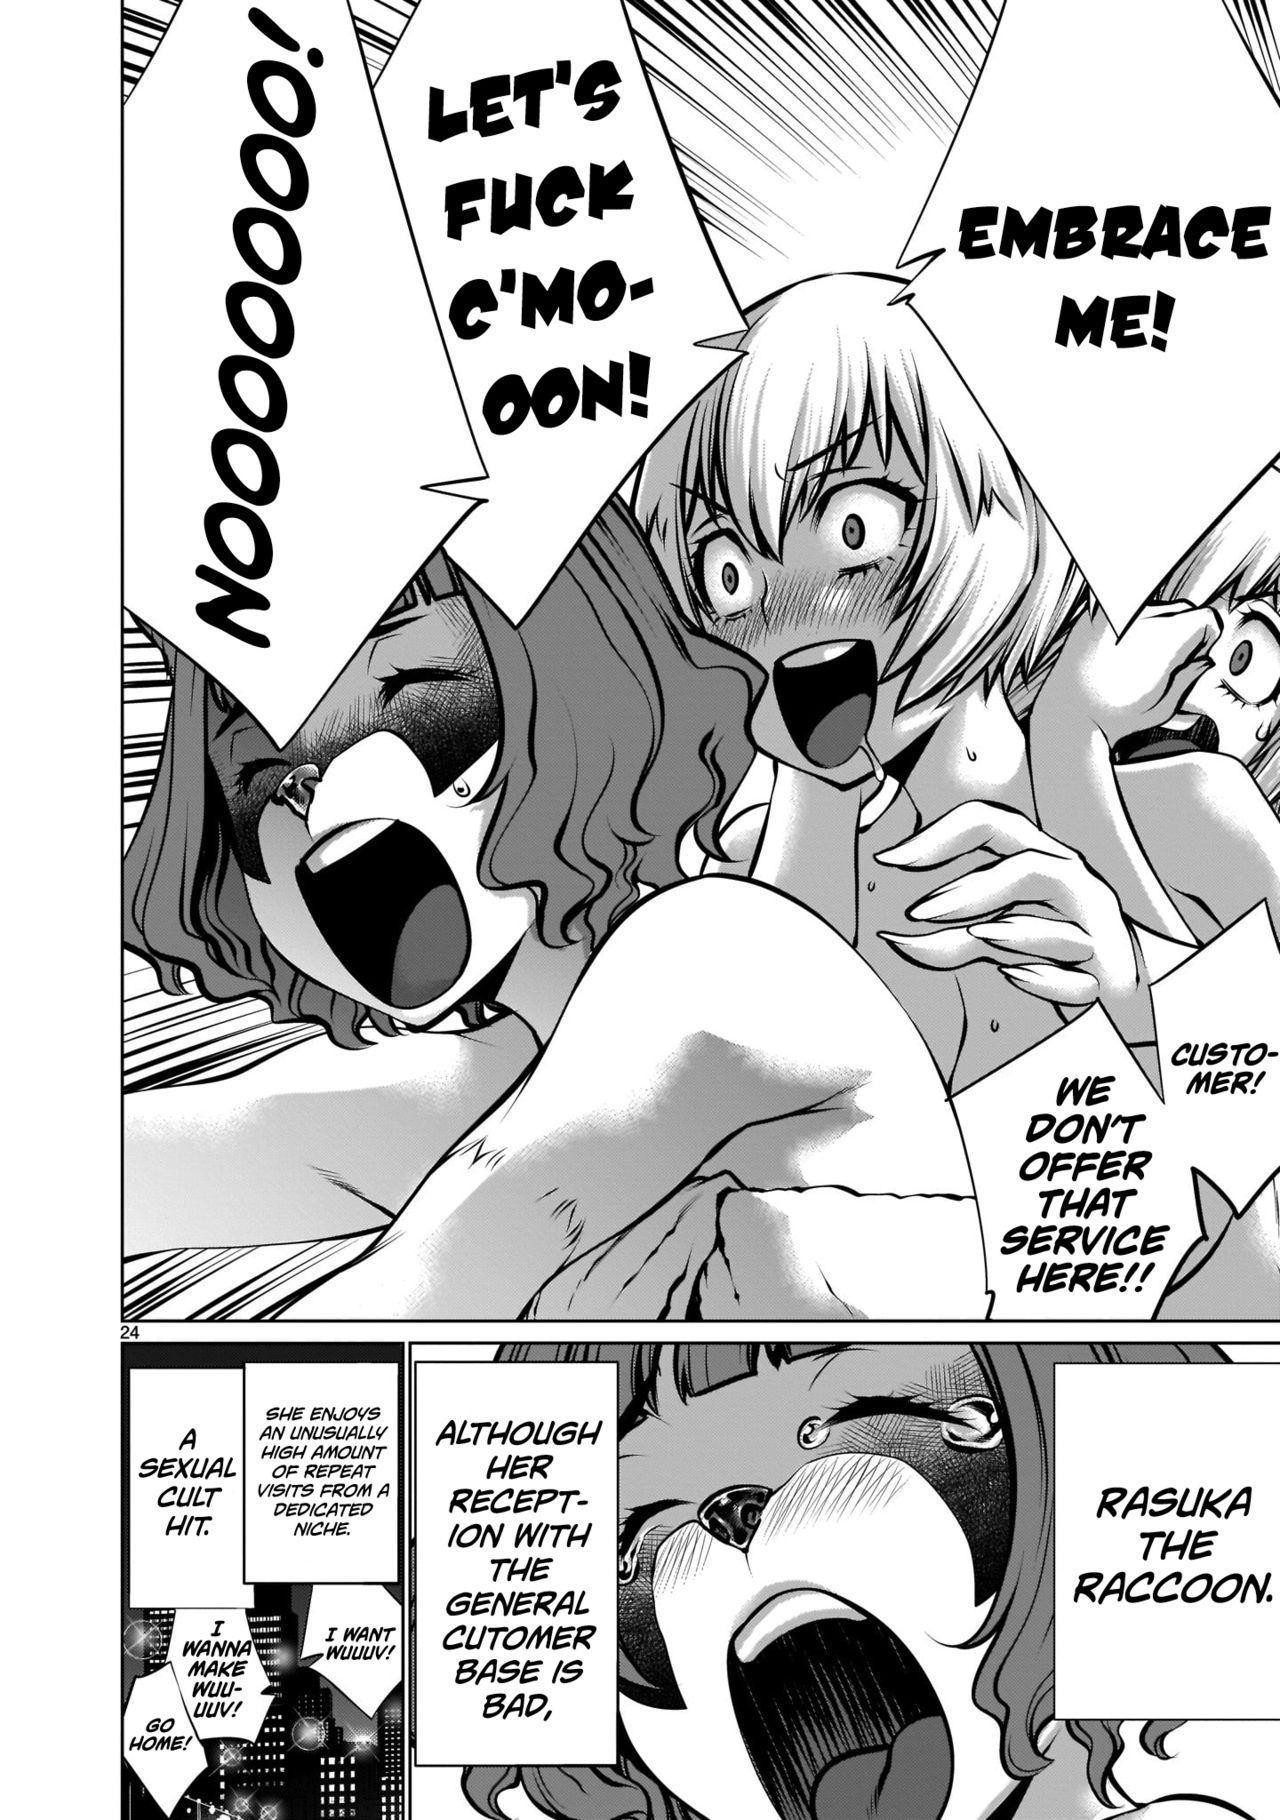 [Wild Heroes] (Sumita Kazuasa, Shinya Murata) Isn't It Too Much? Inaba-san/Hoshi Gari Sugidesho? Inaba-san chapter 10 [English] [Roadwarior2] 21